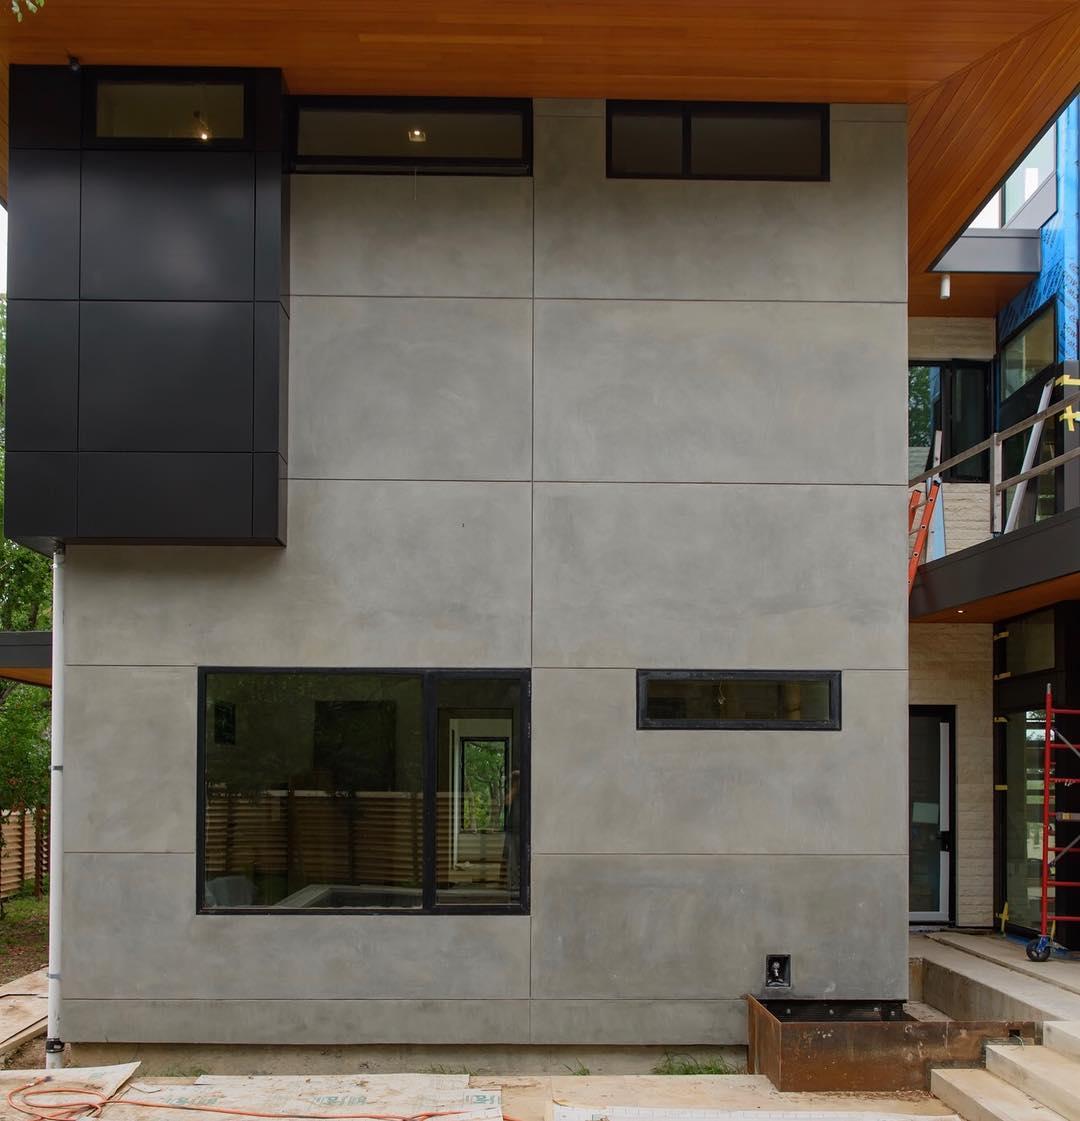 LaHabra Stucco, Break Metal, Fleetwood Windows and Douglas Fir. What a great combination!! Built by @foursquarebuilders Photo by @redpantsstudio